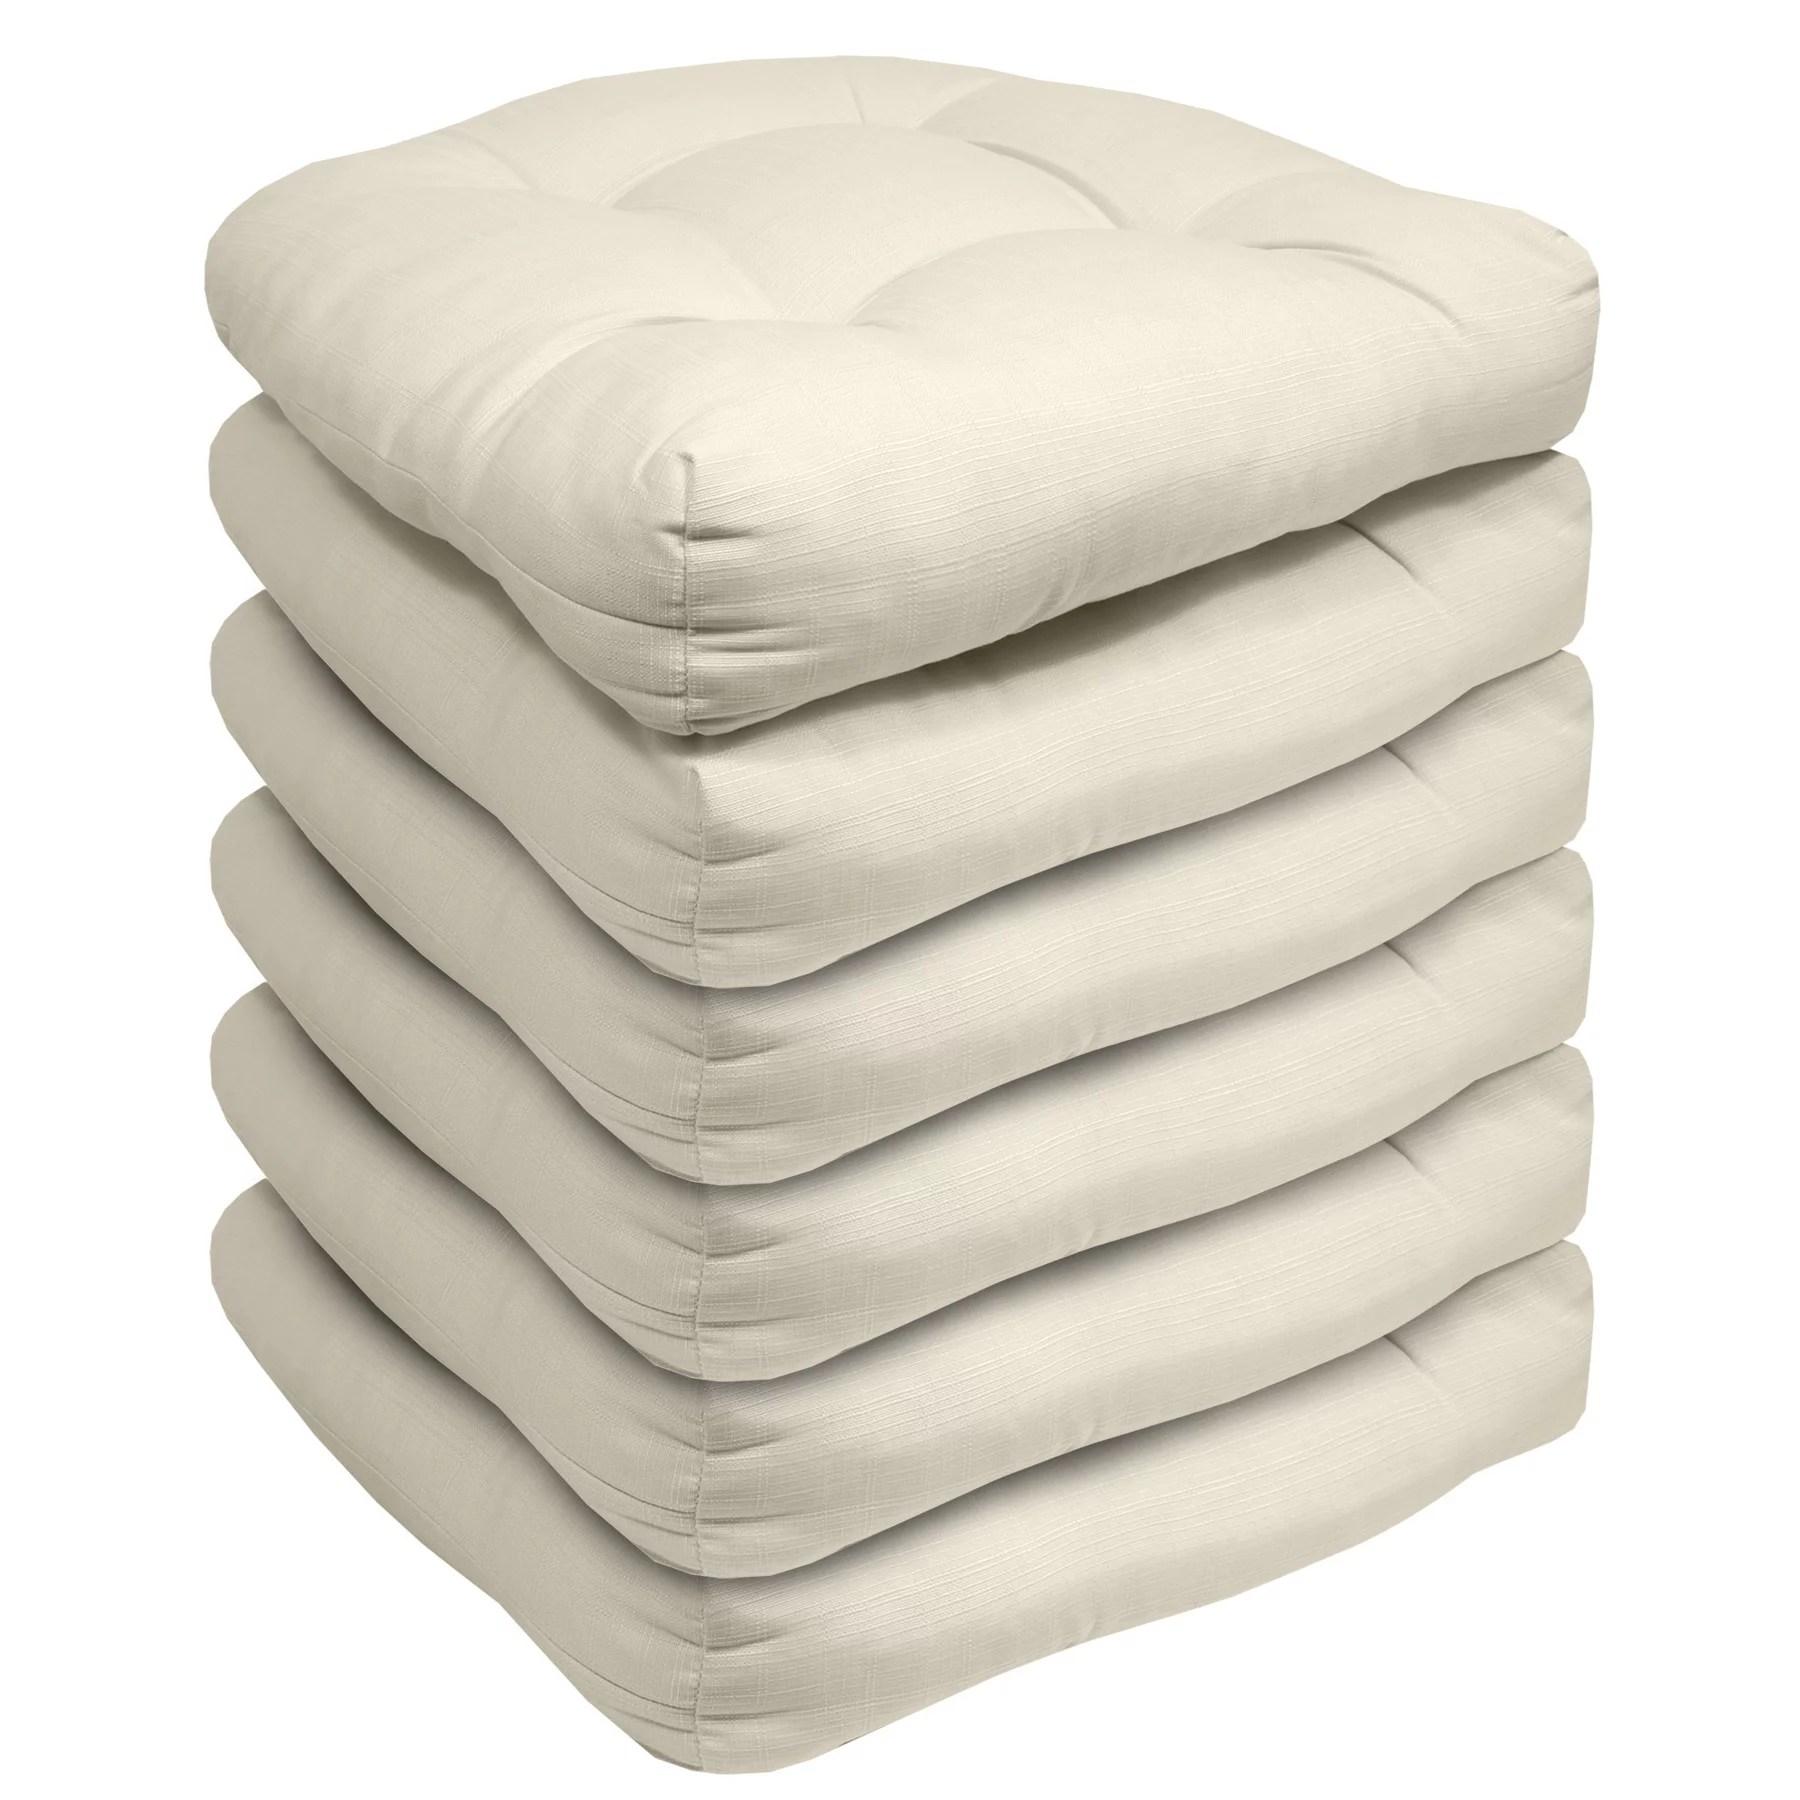 indoor outdoor reversible patio seat cushion pad 6 pack cream 19 x 19